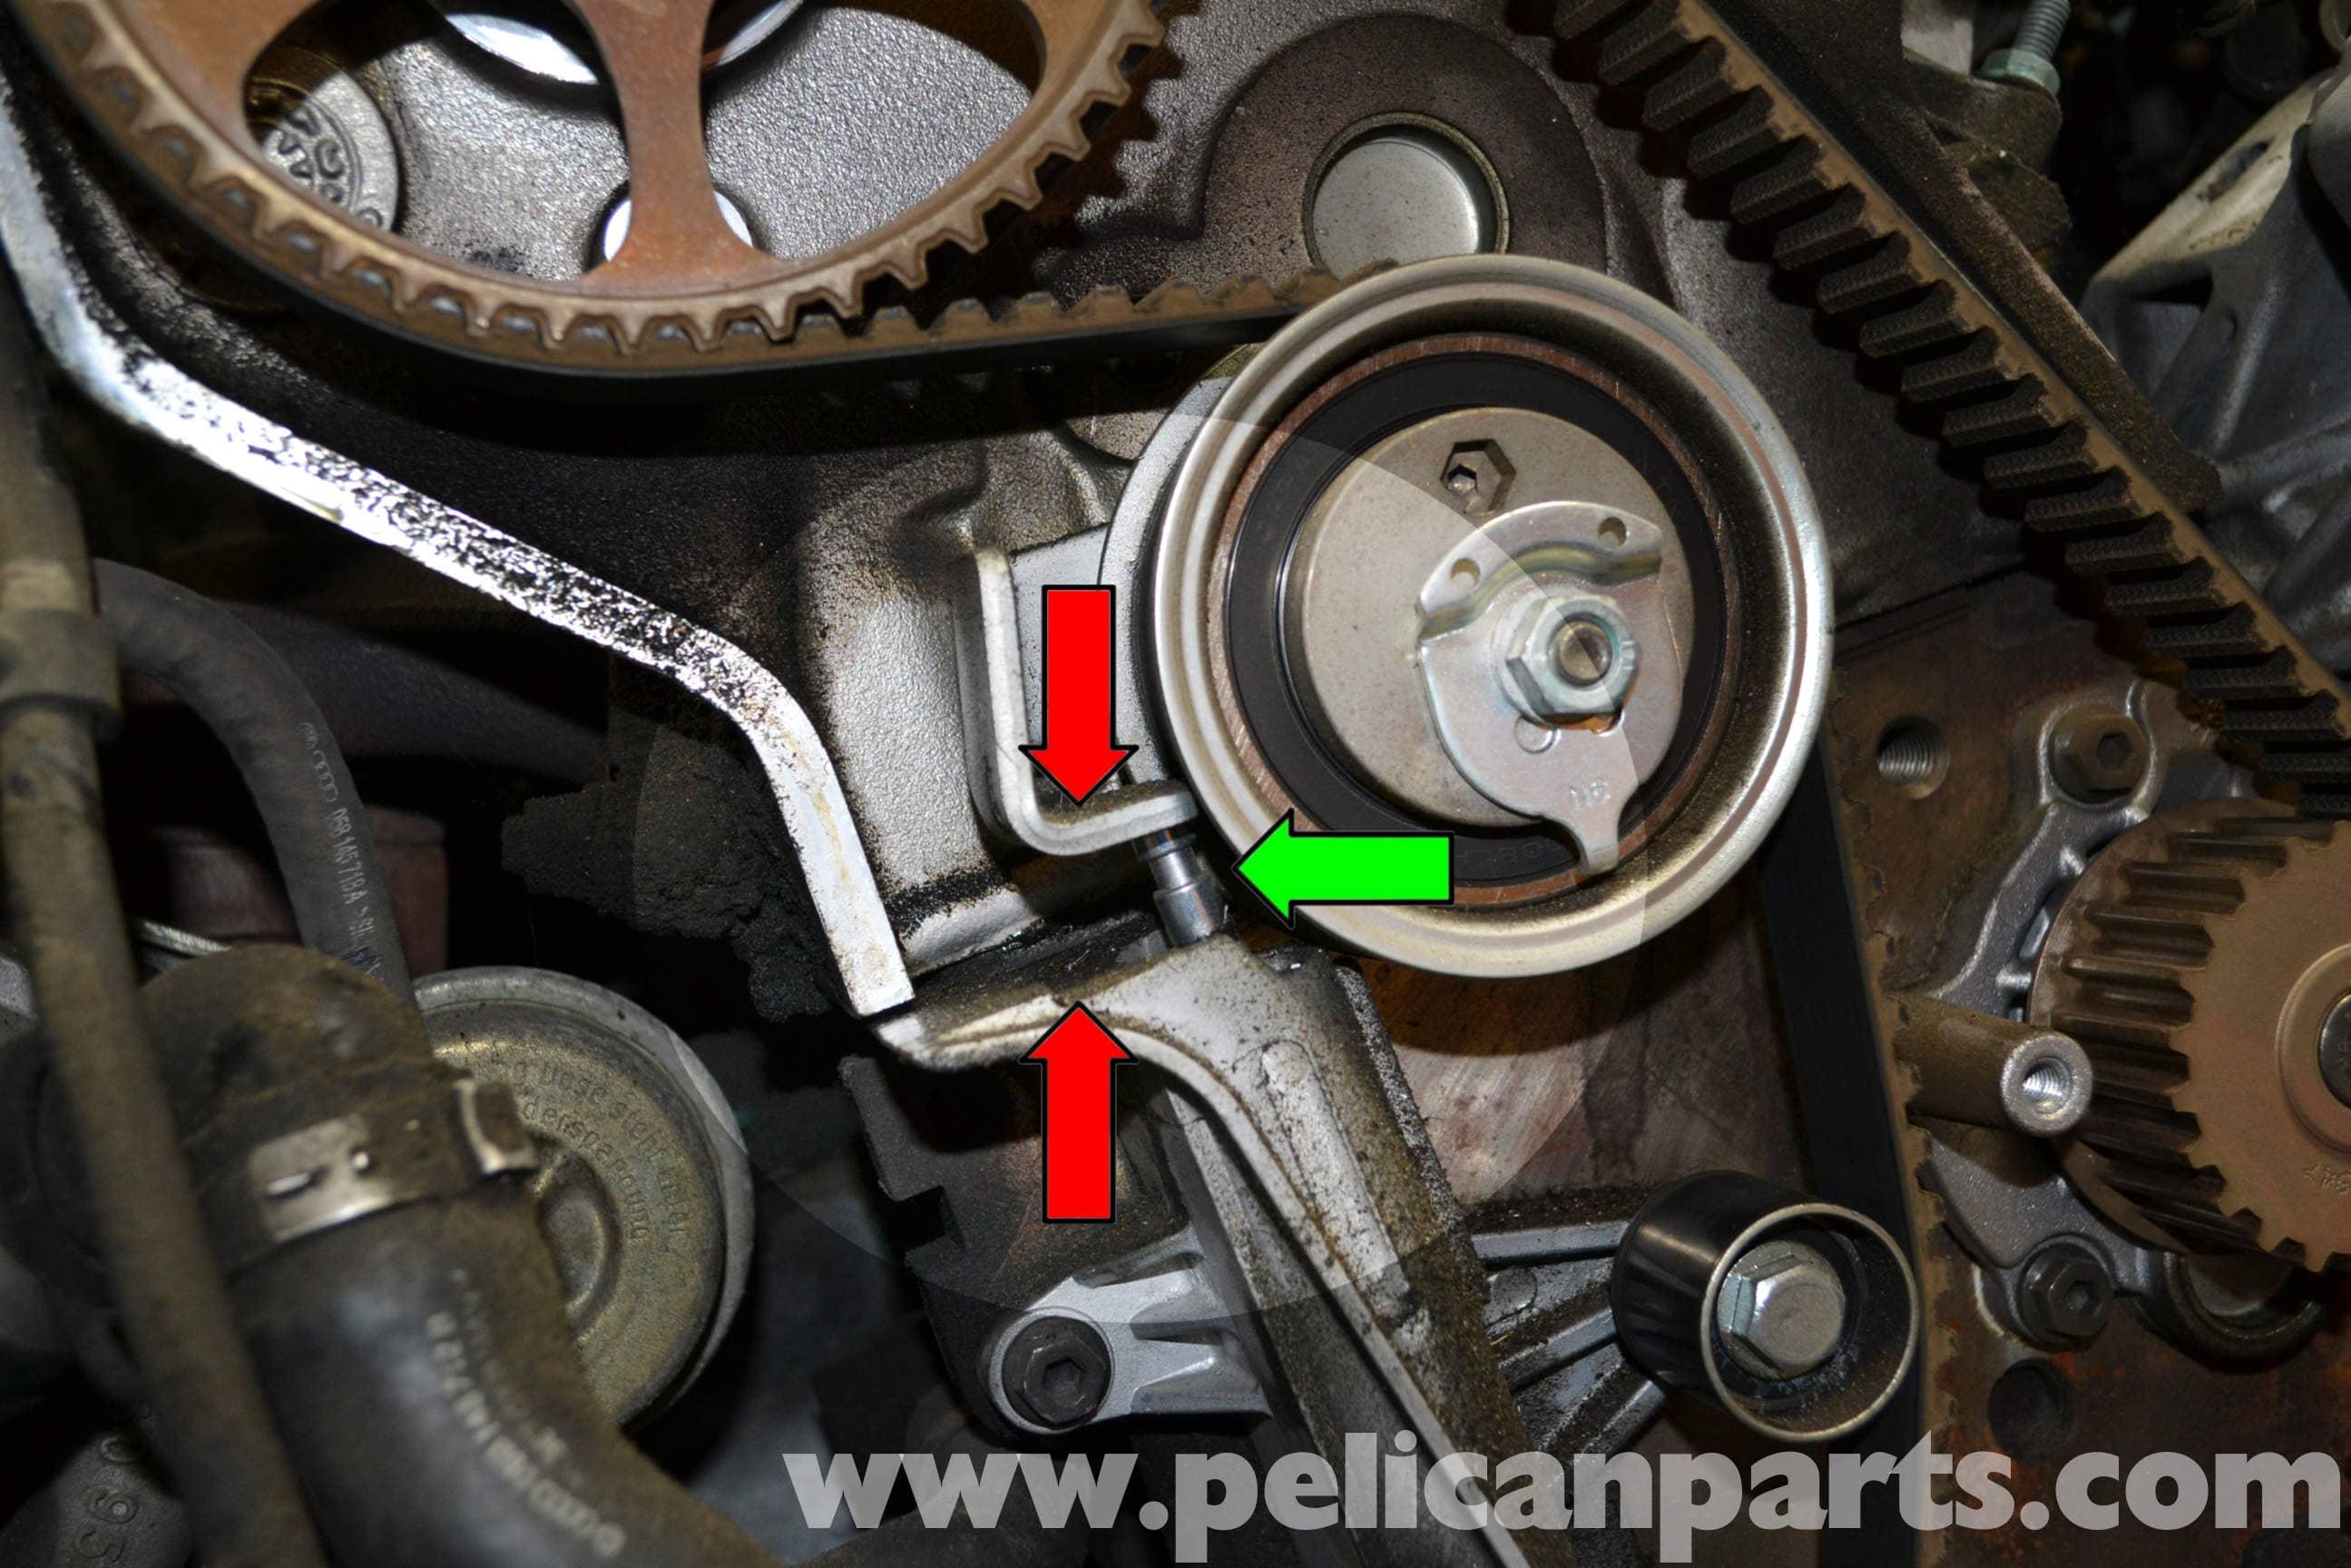 audi a4 b6 timing belt tensioner replacement 1 8t 2002 2008 rh pelicanparts com 03 Audi A4 Specs Audi A4 1.8L Turbo Horsepower